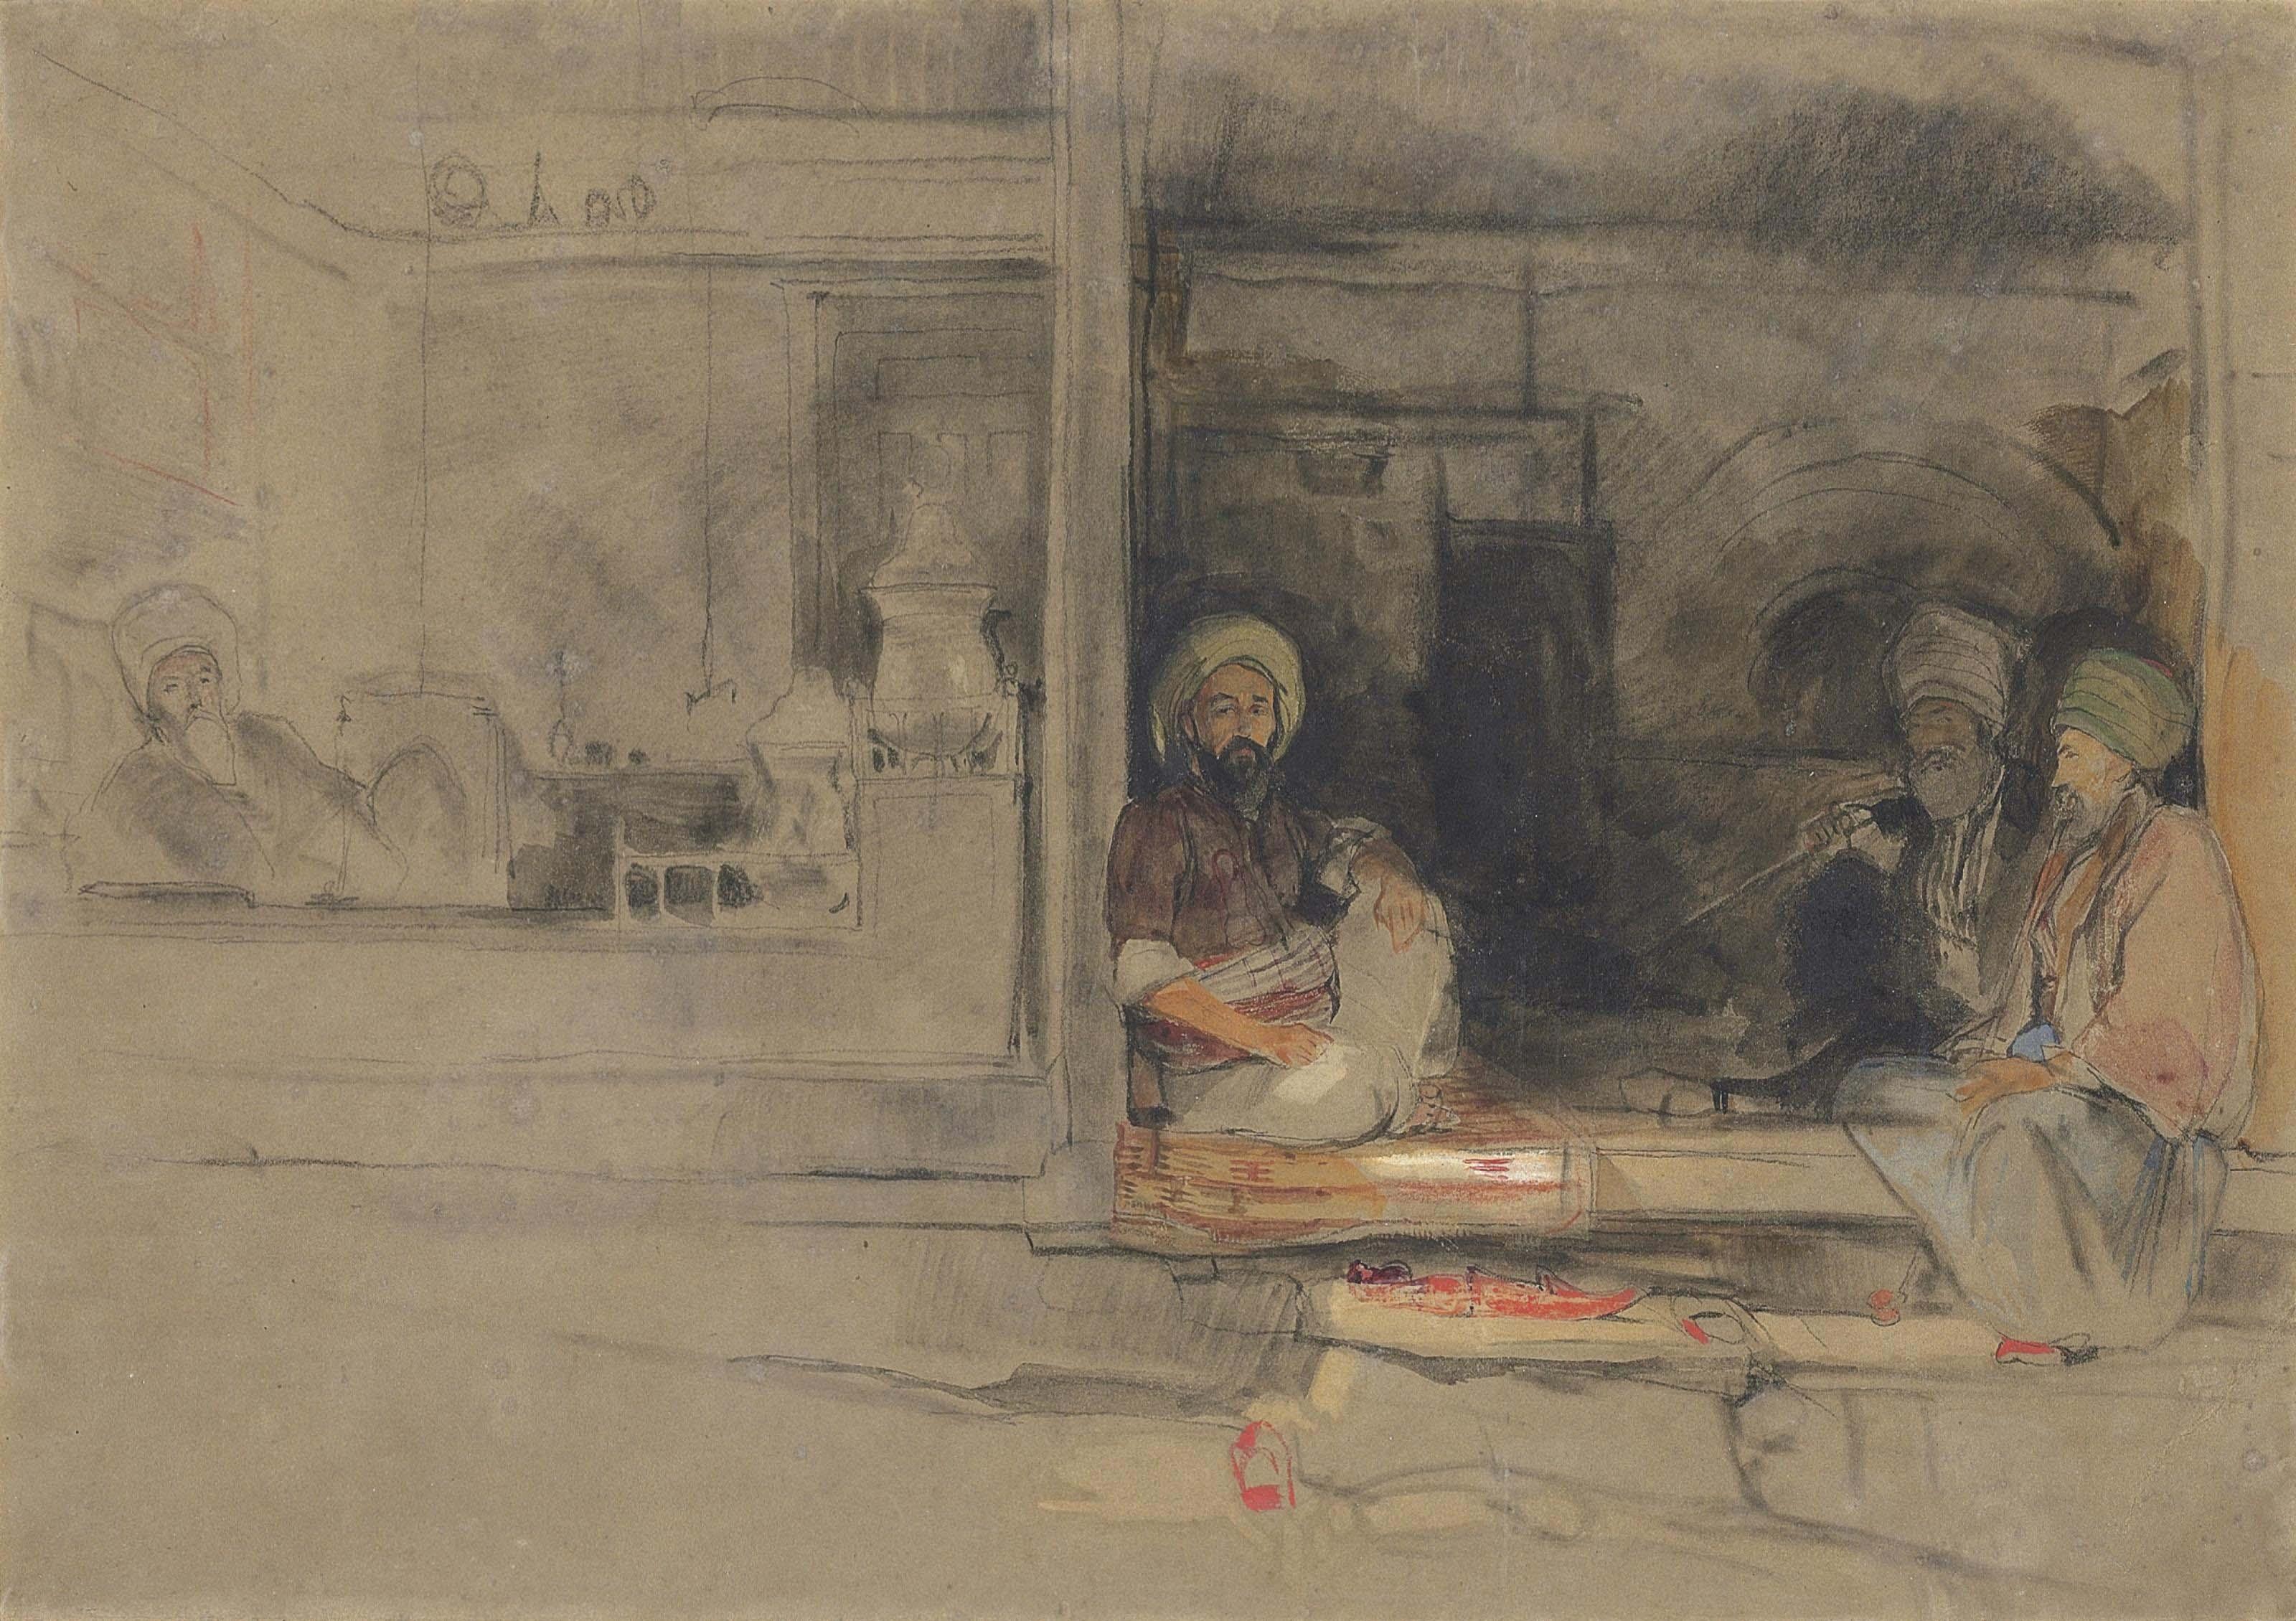 A Kibab Shop, Scutari, Asia Minor